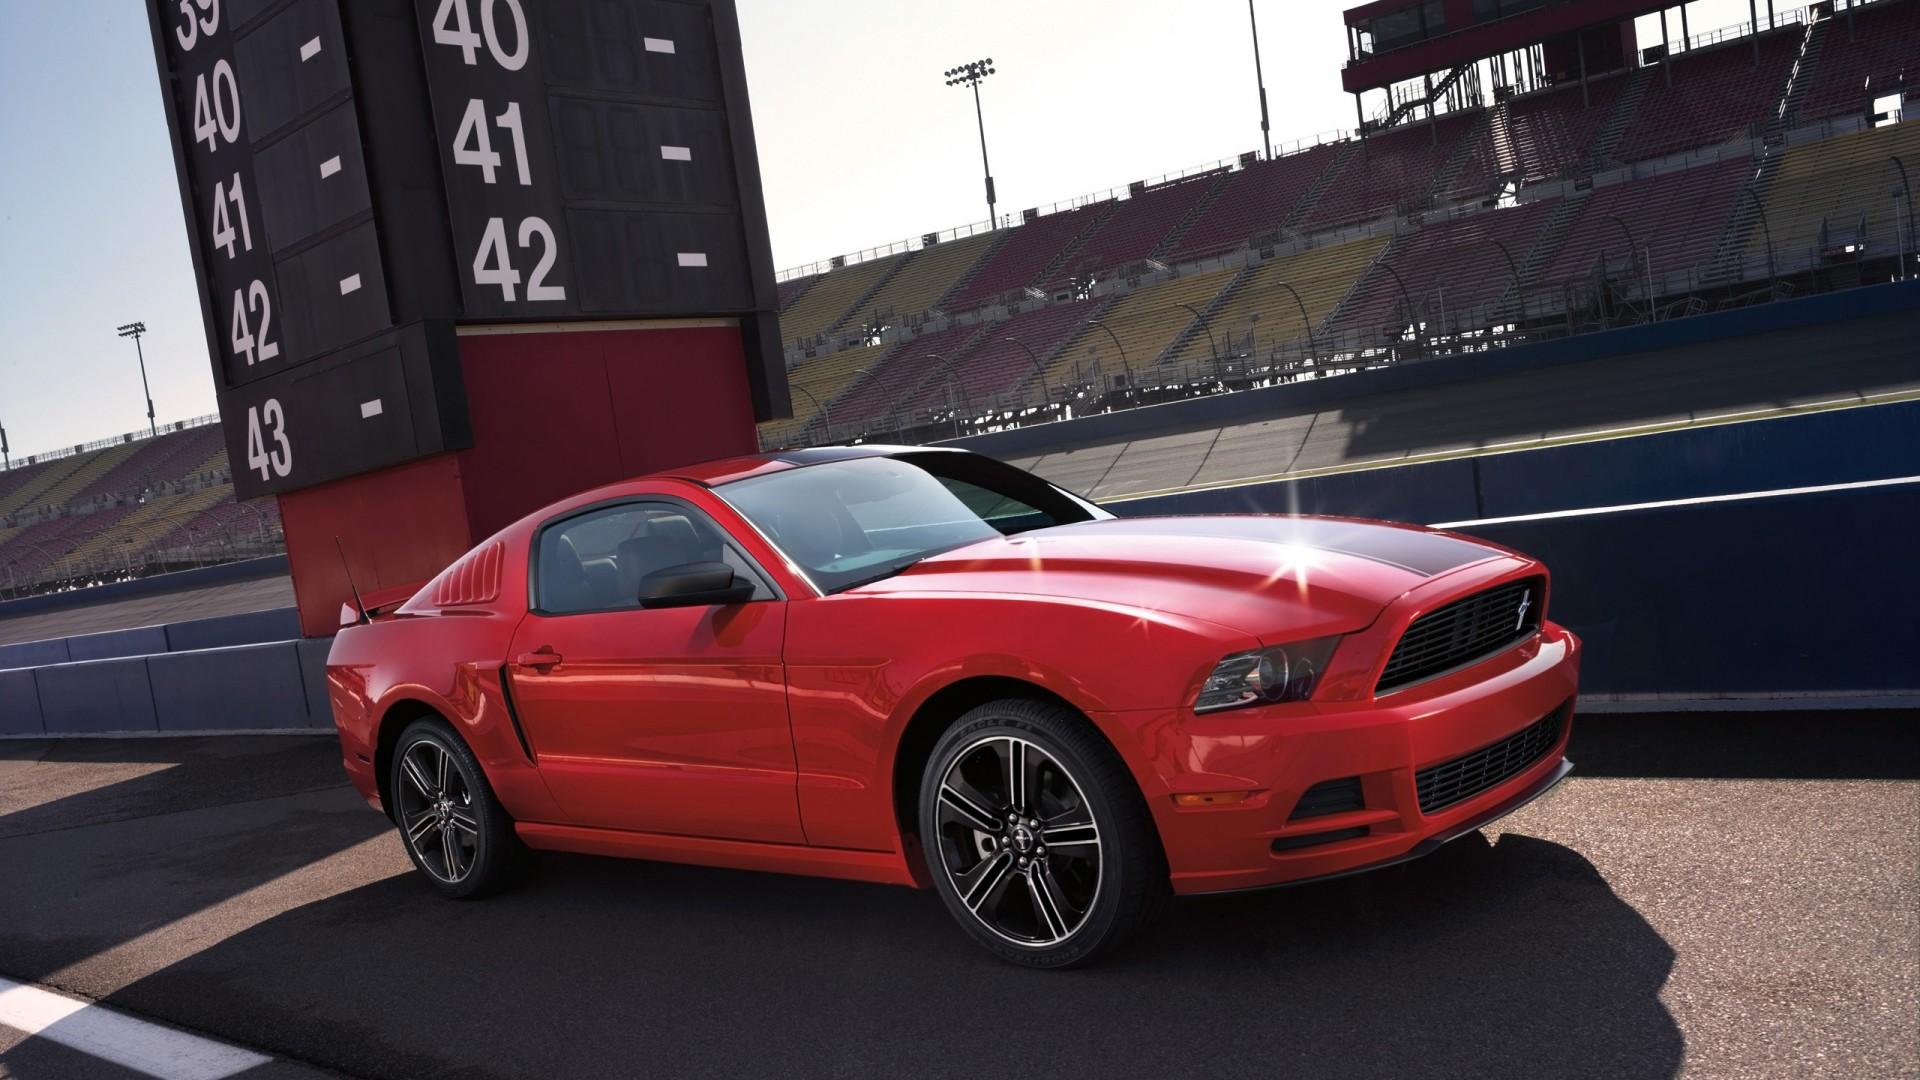 Infiniti Car Logo Wallpaper 2014 Ford Mustang Gt Wallpaper Hd Car Wallpapers Id 3913